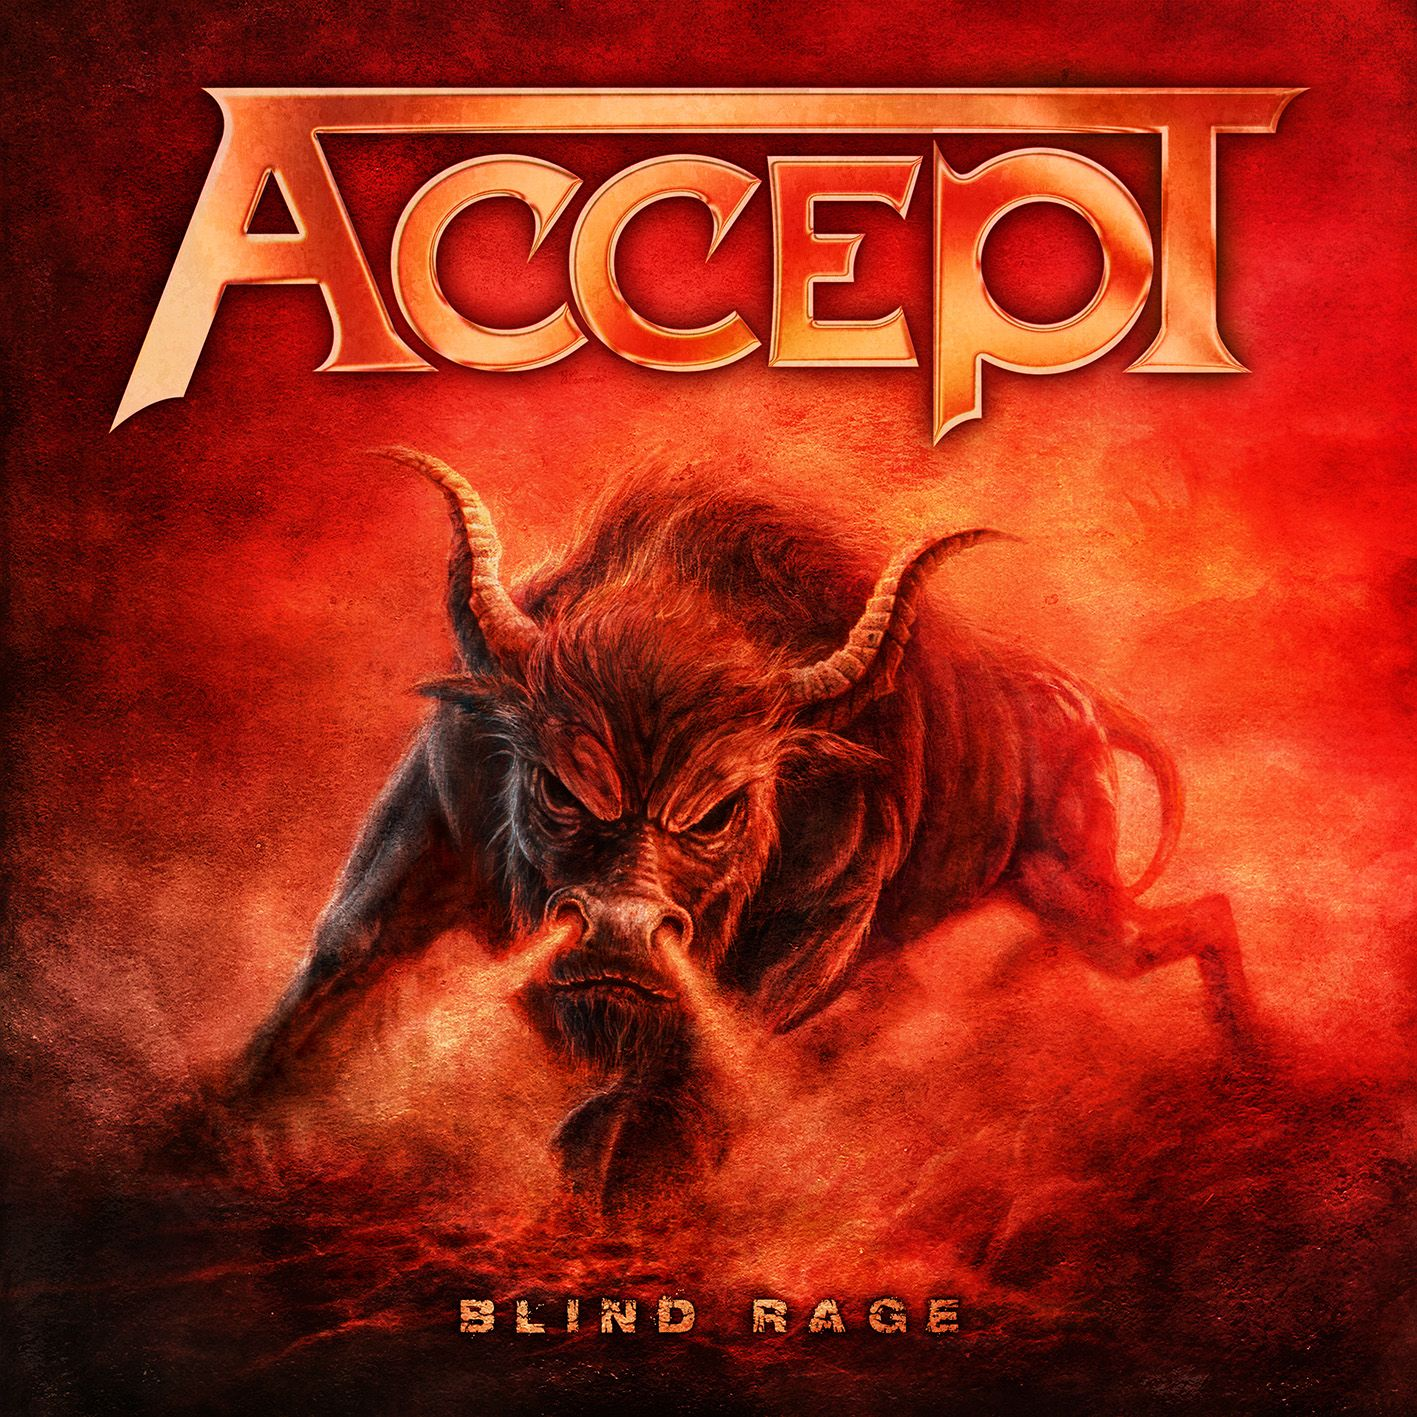 Accept - Blind Rage album cover